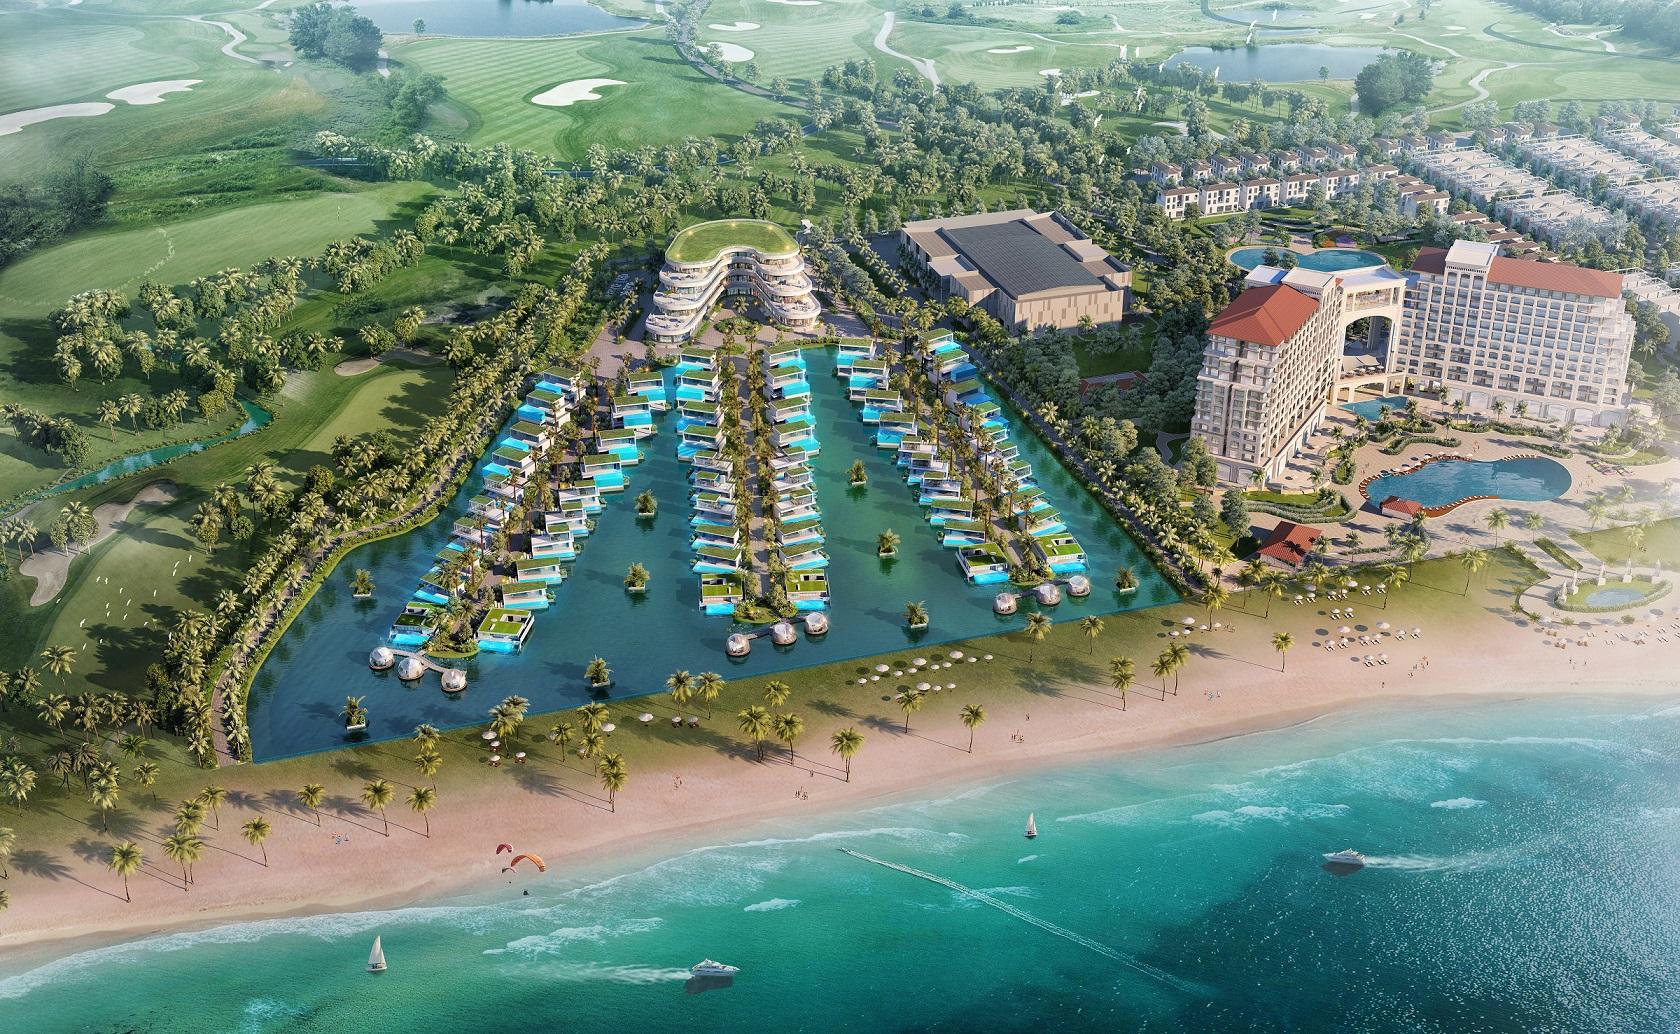 Phân khu Lagoona bên cạnh FLC Grand Hotel FLC Beach & Golf resort